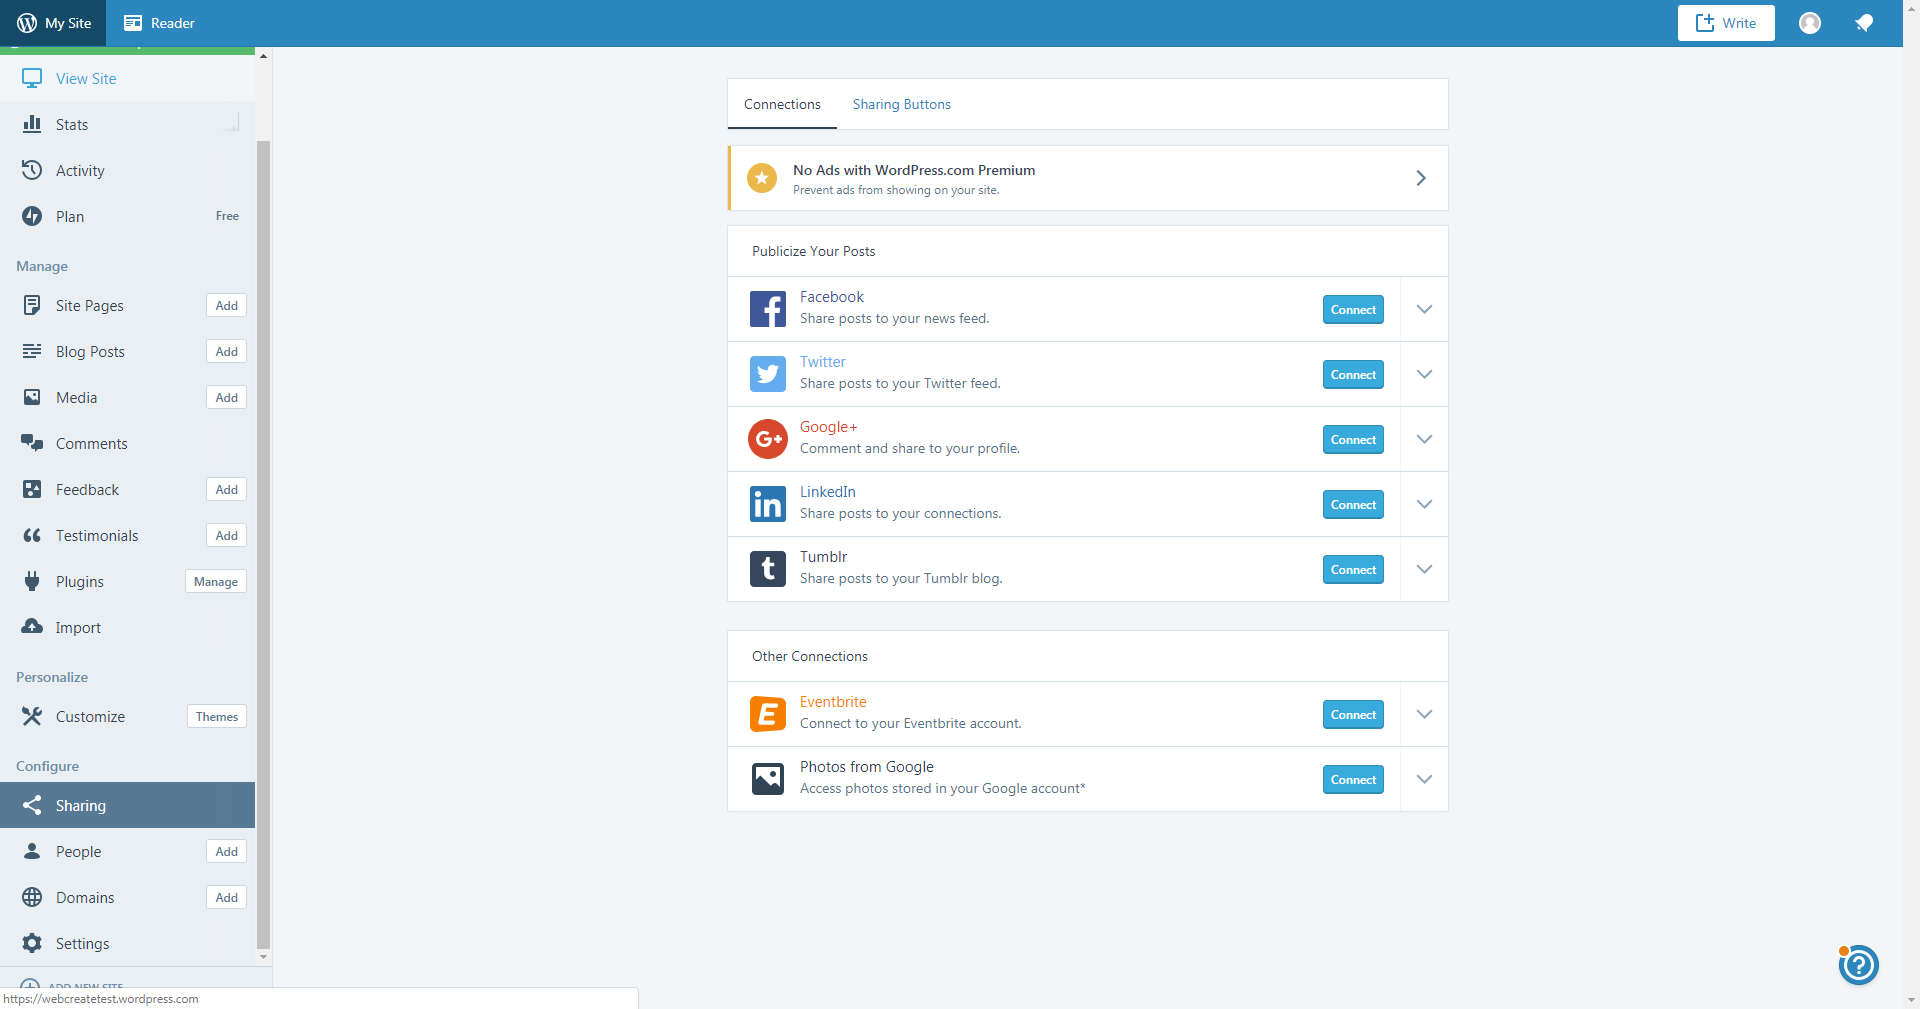 WordPress.com Sharing tools